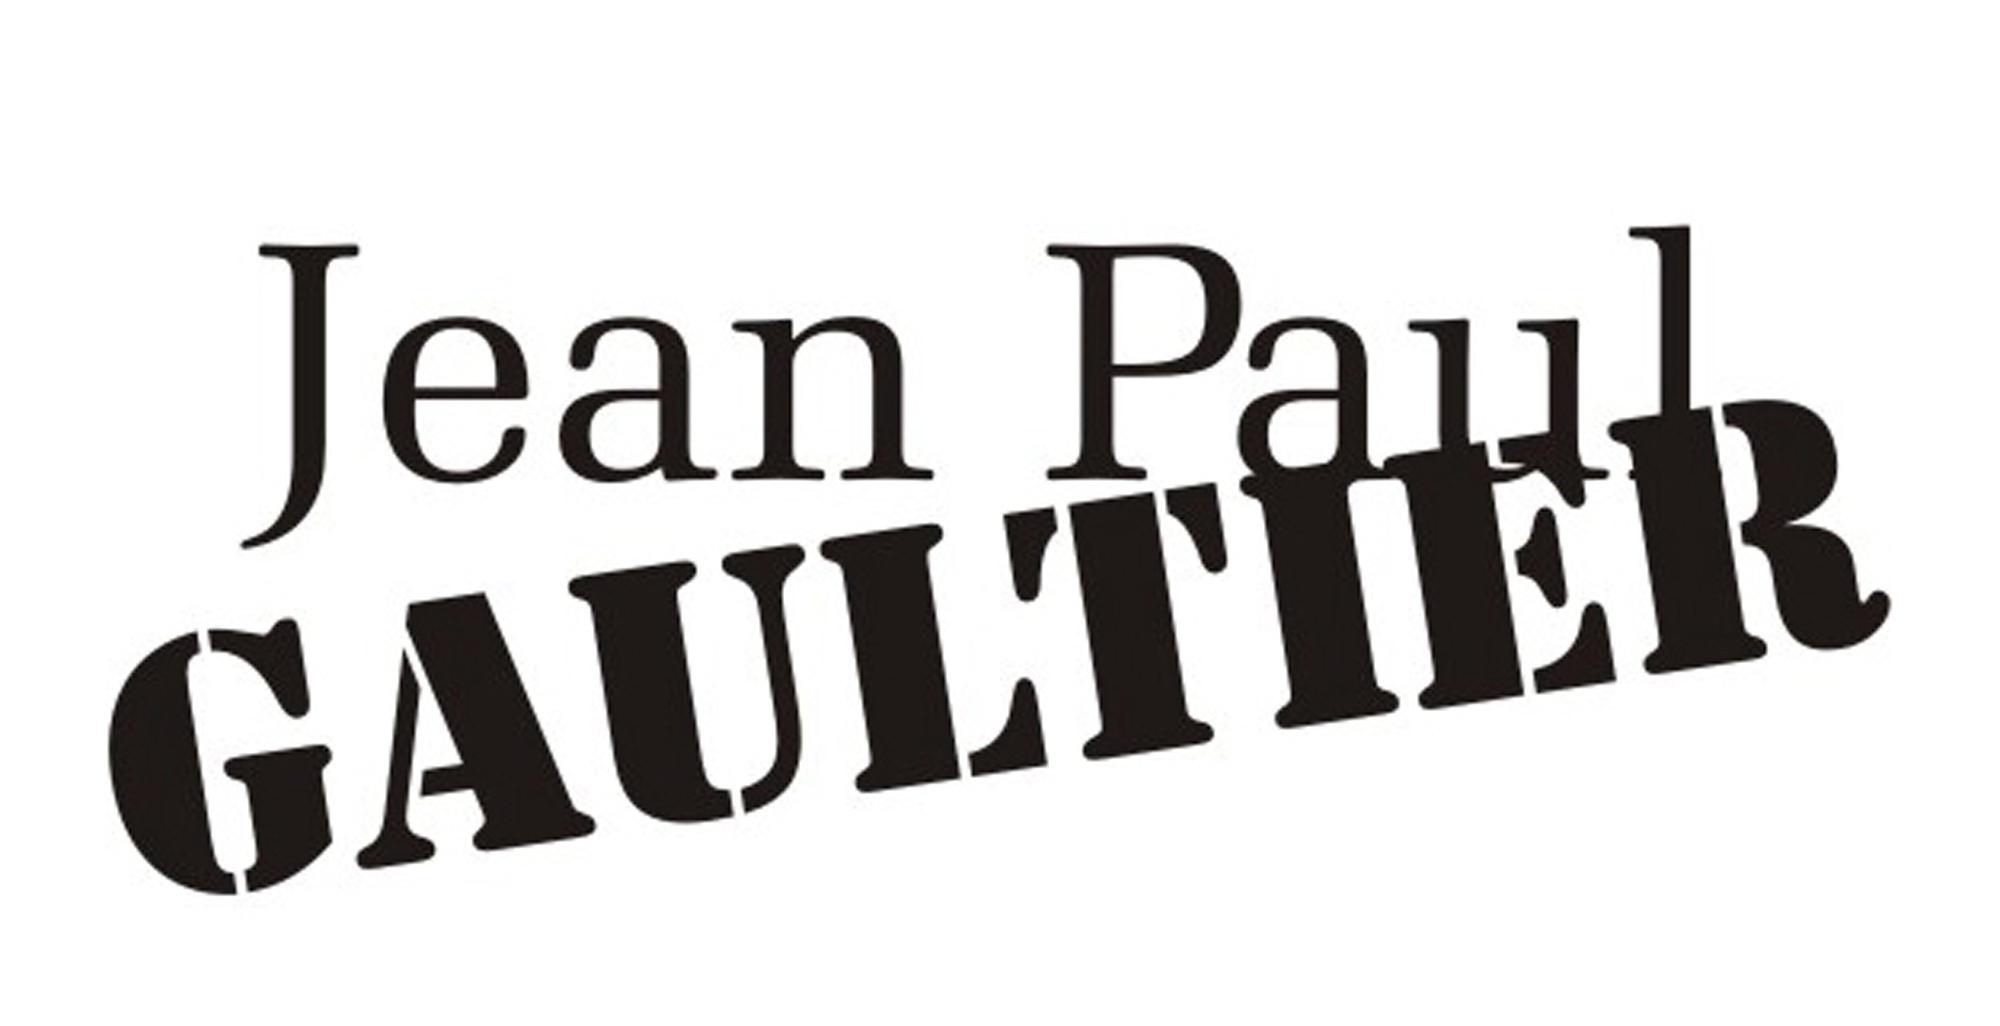 Jean Paul GAULTIER / ジャンポール ゴルチエの最新アイテムを個人輸入・海外通販